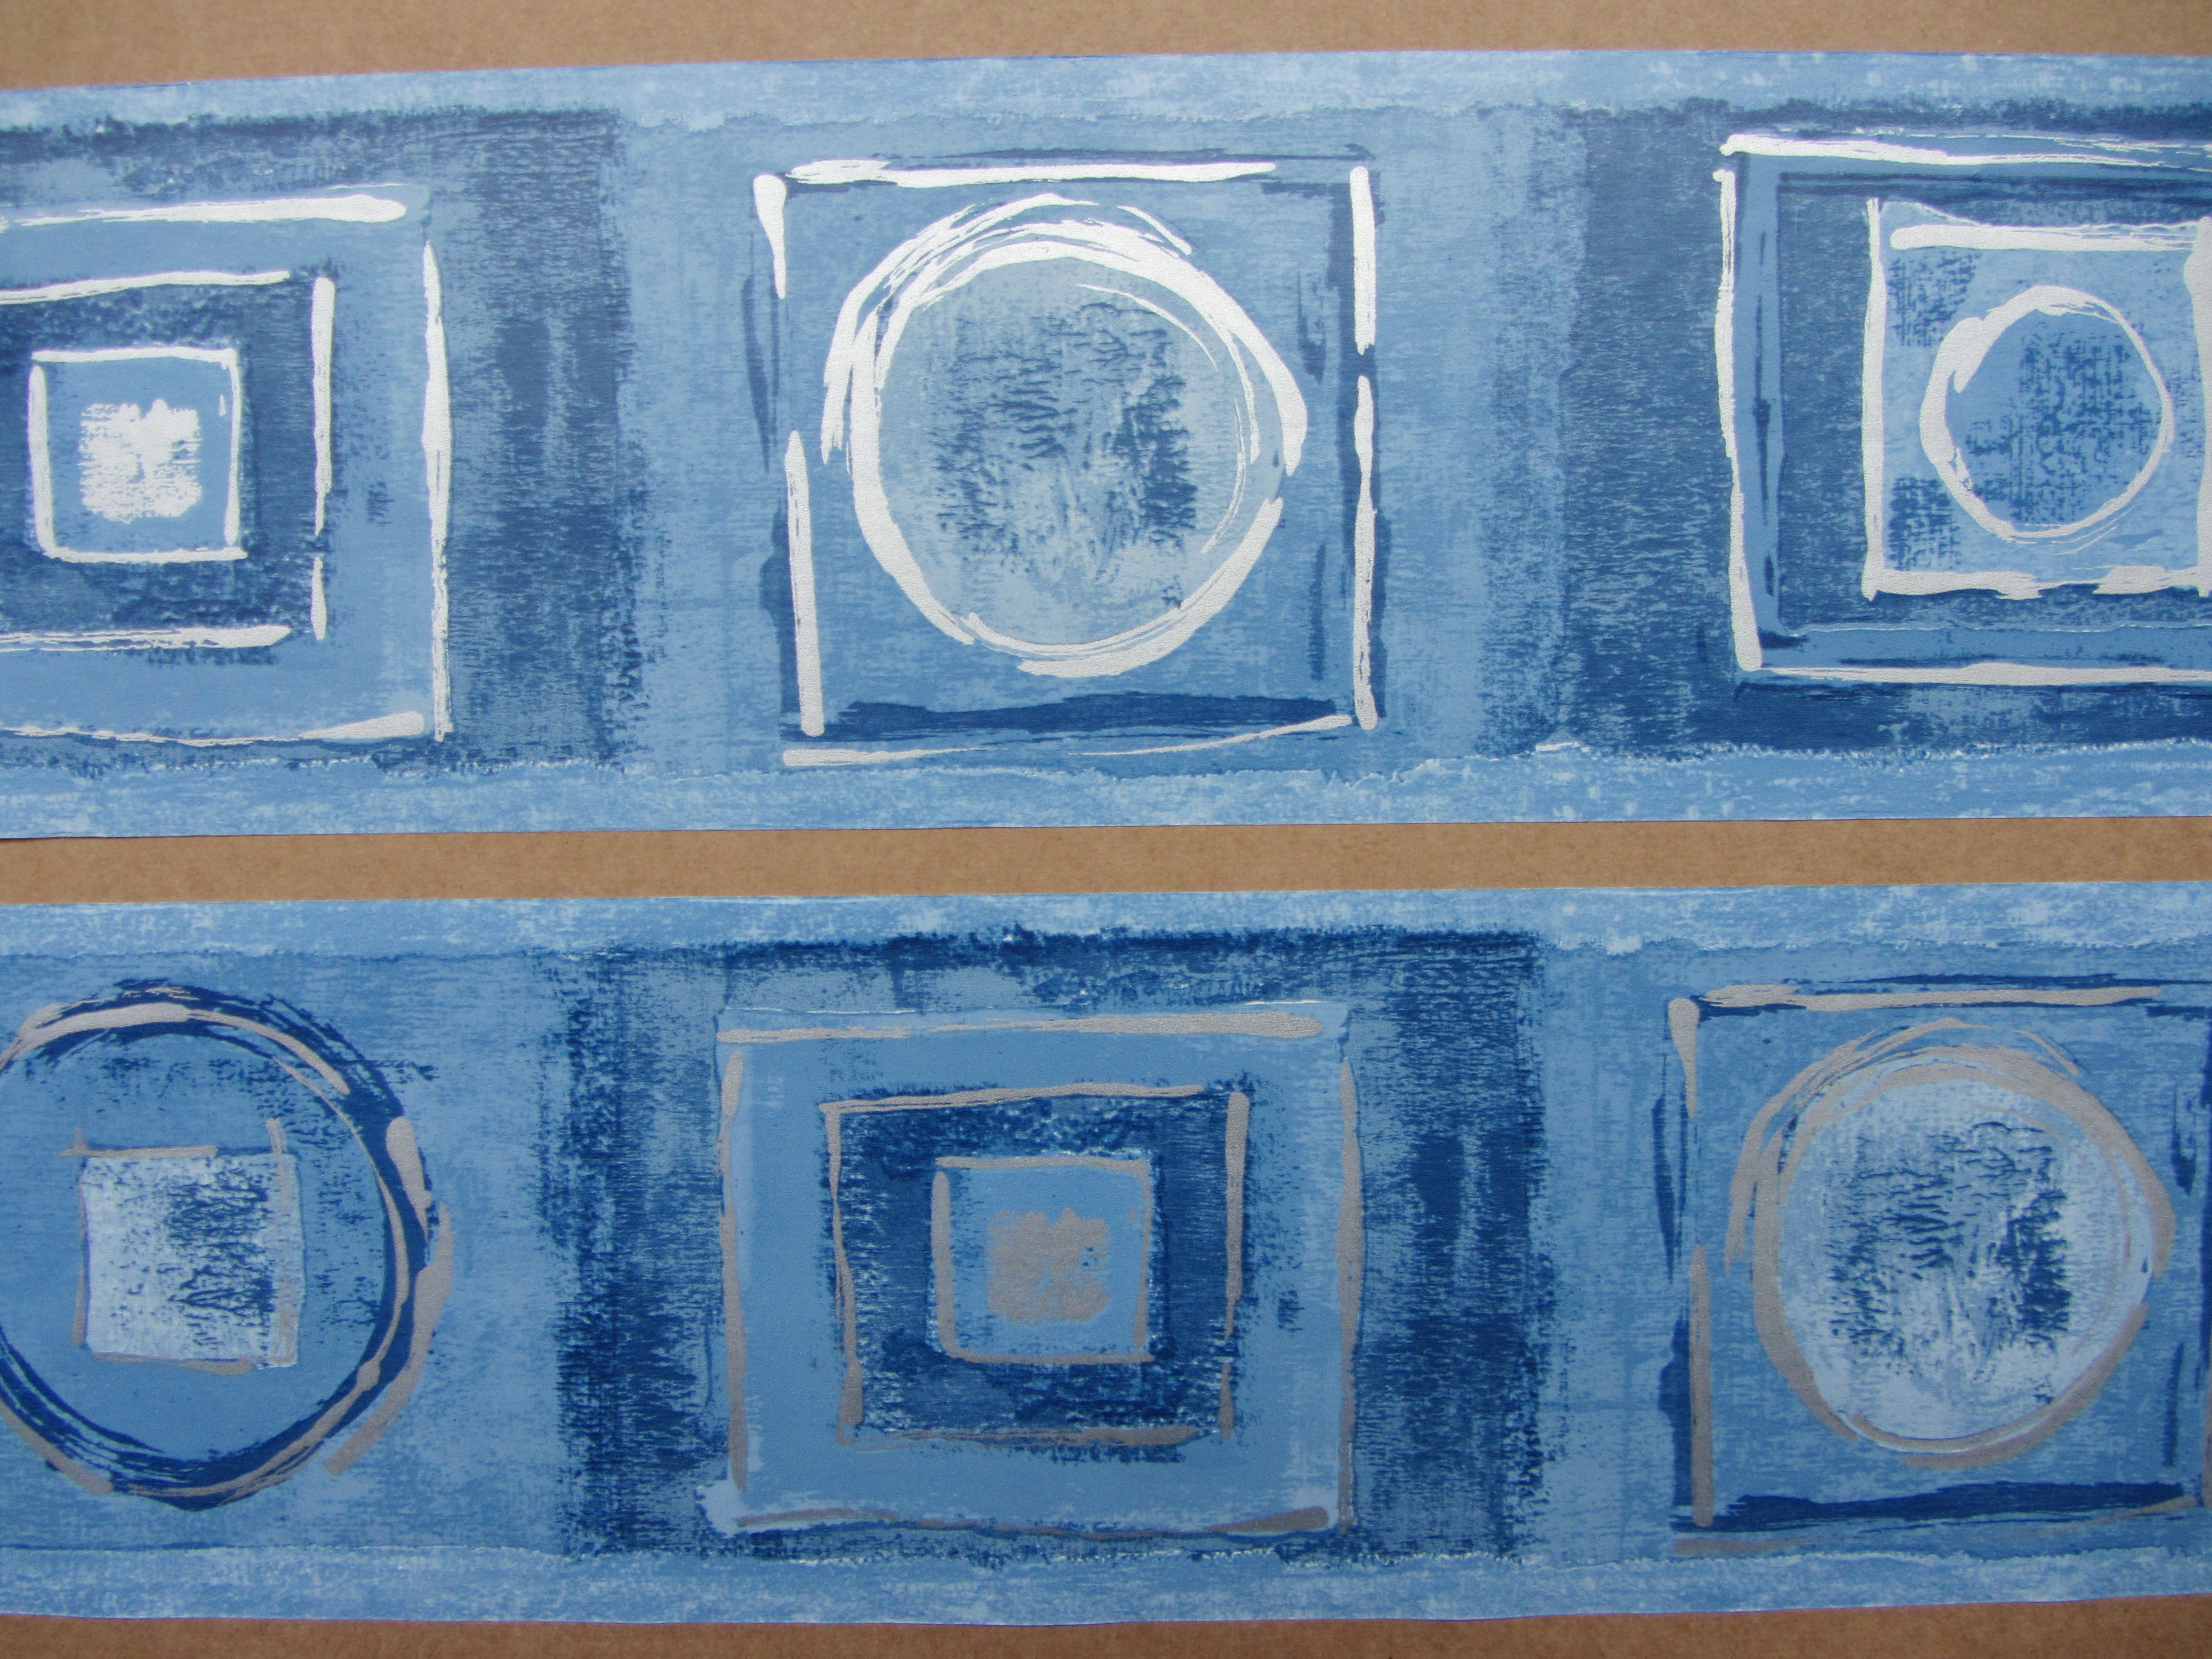 Details about SAHARA DENIH BLUE WALLPAPER BORDER SELF ADHESIVE BEDROOM 4000x3000